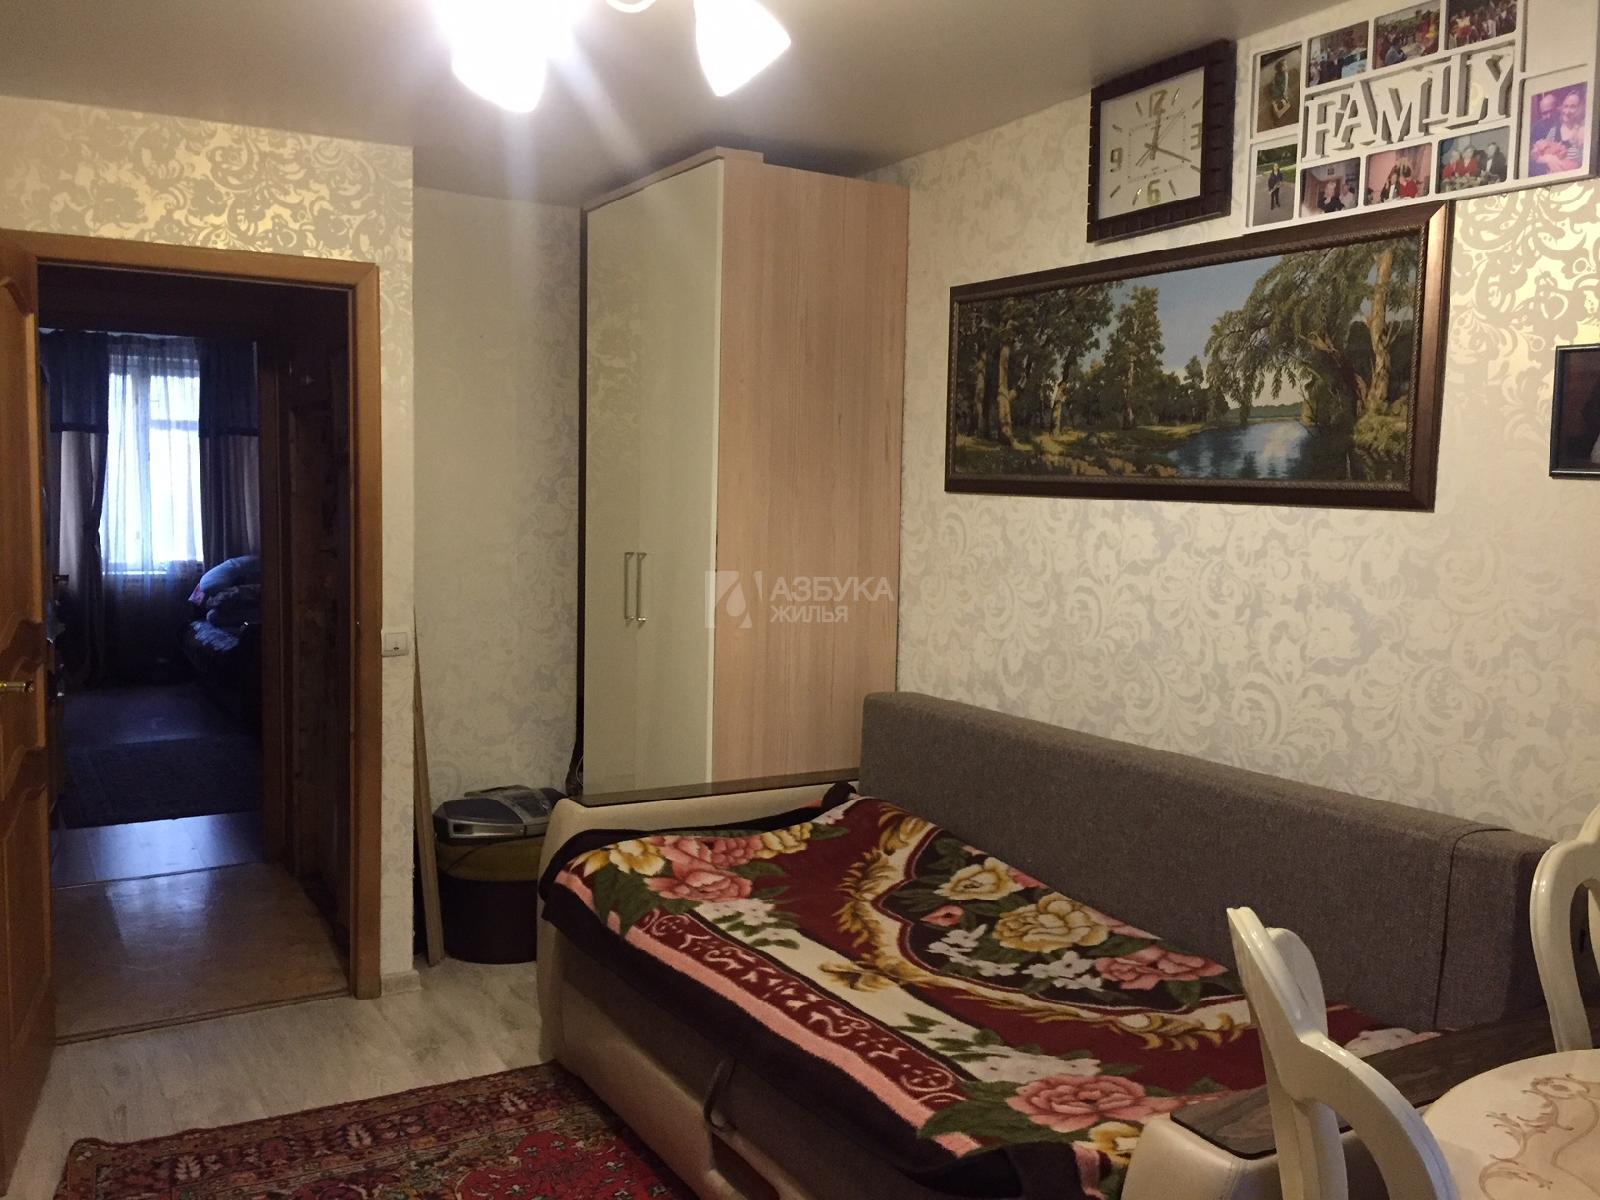 Фото №23 - 3-комнатная квартира, Москва, Криворожская улица 15, метро Нагорная